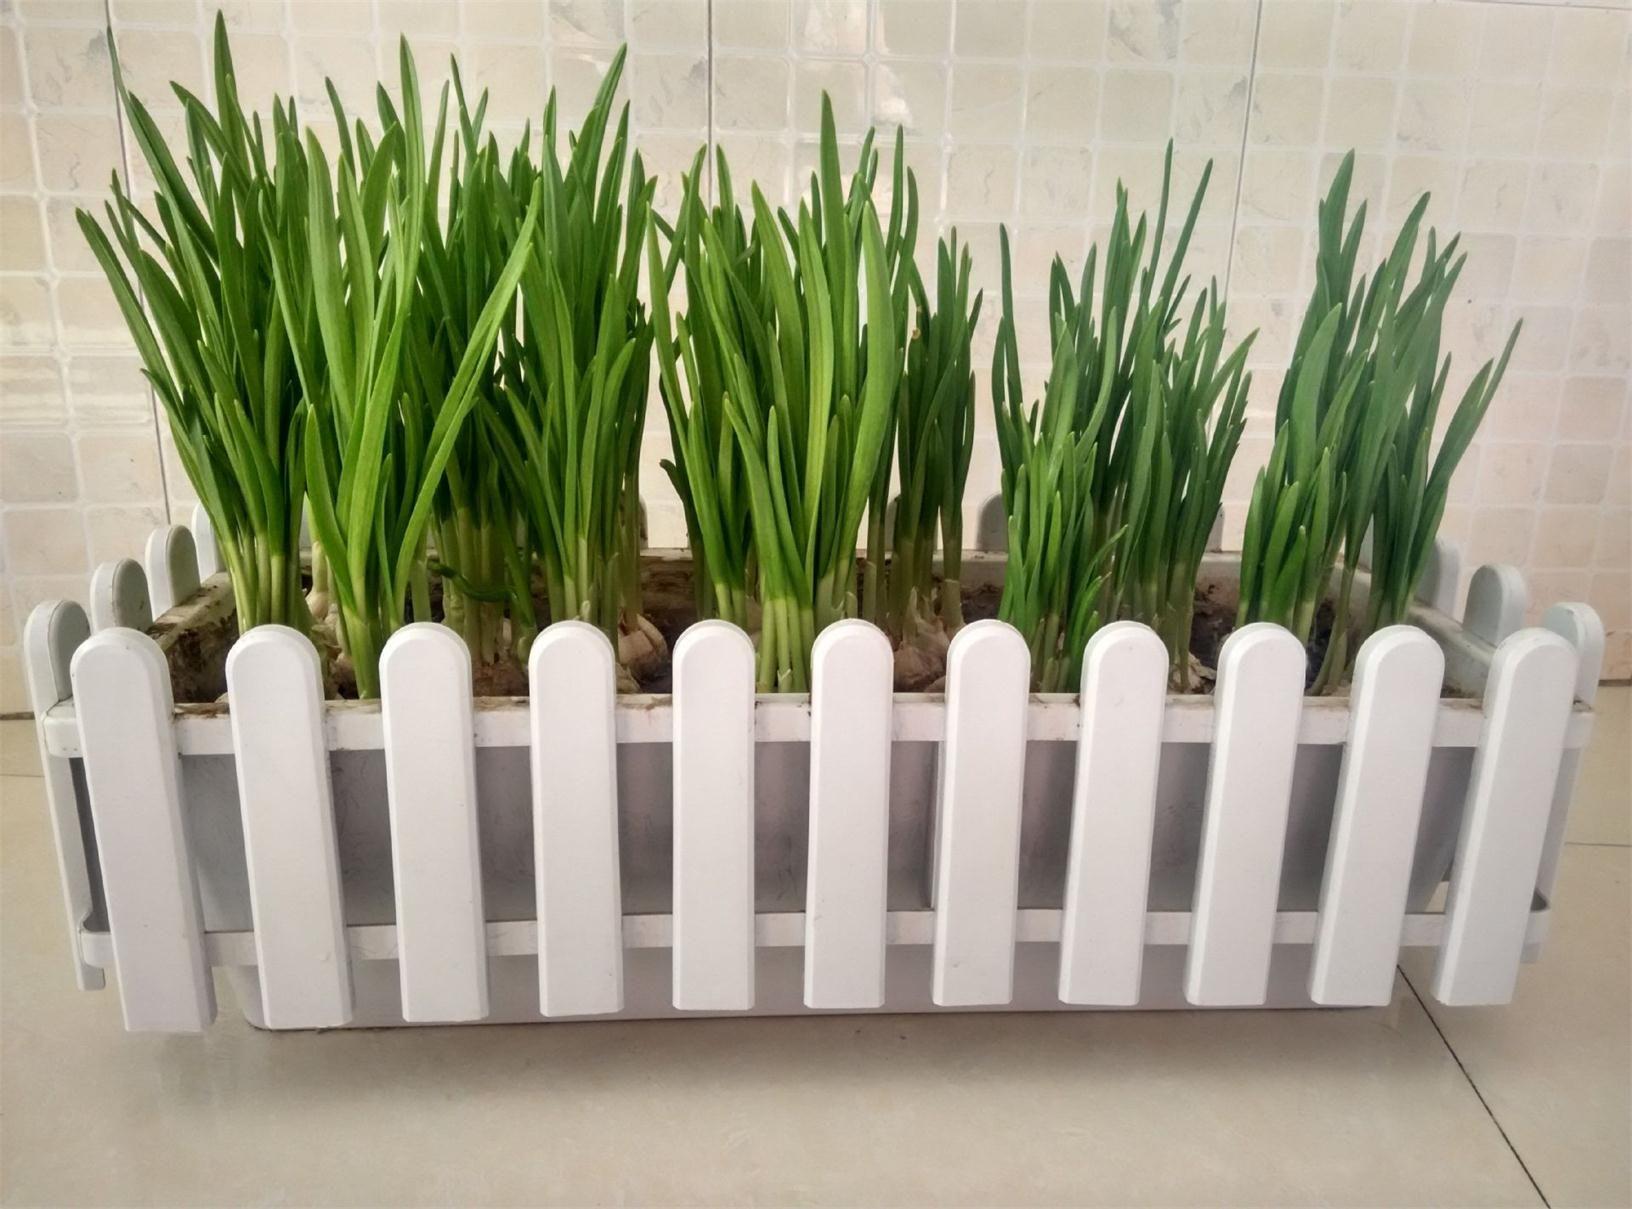 Grosshandel Balkon Garten Blumentopfe Rechteckige Pflanzer Zaun